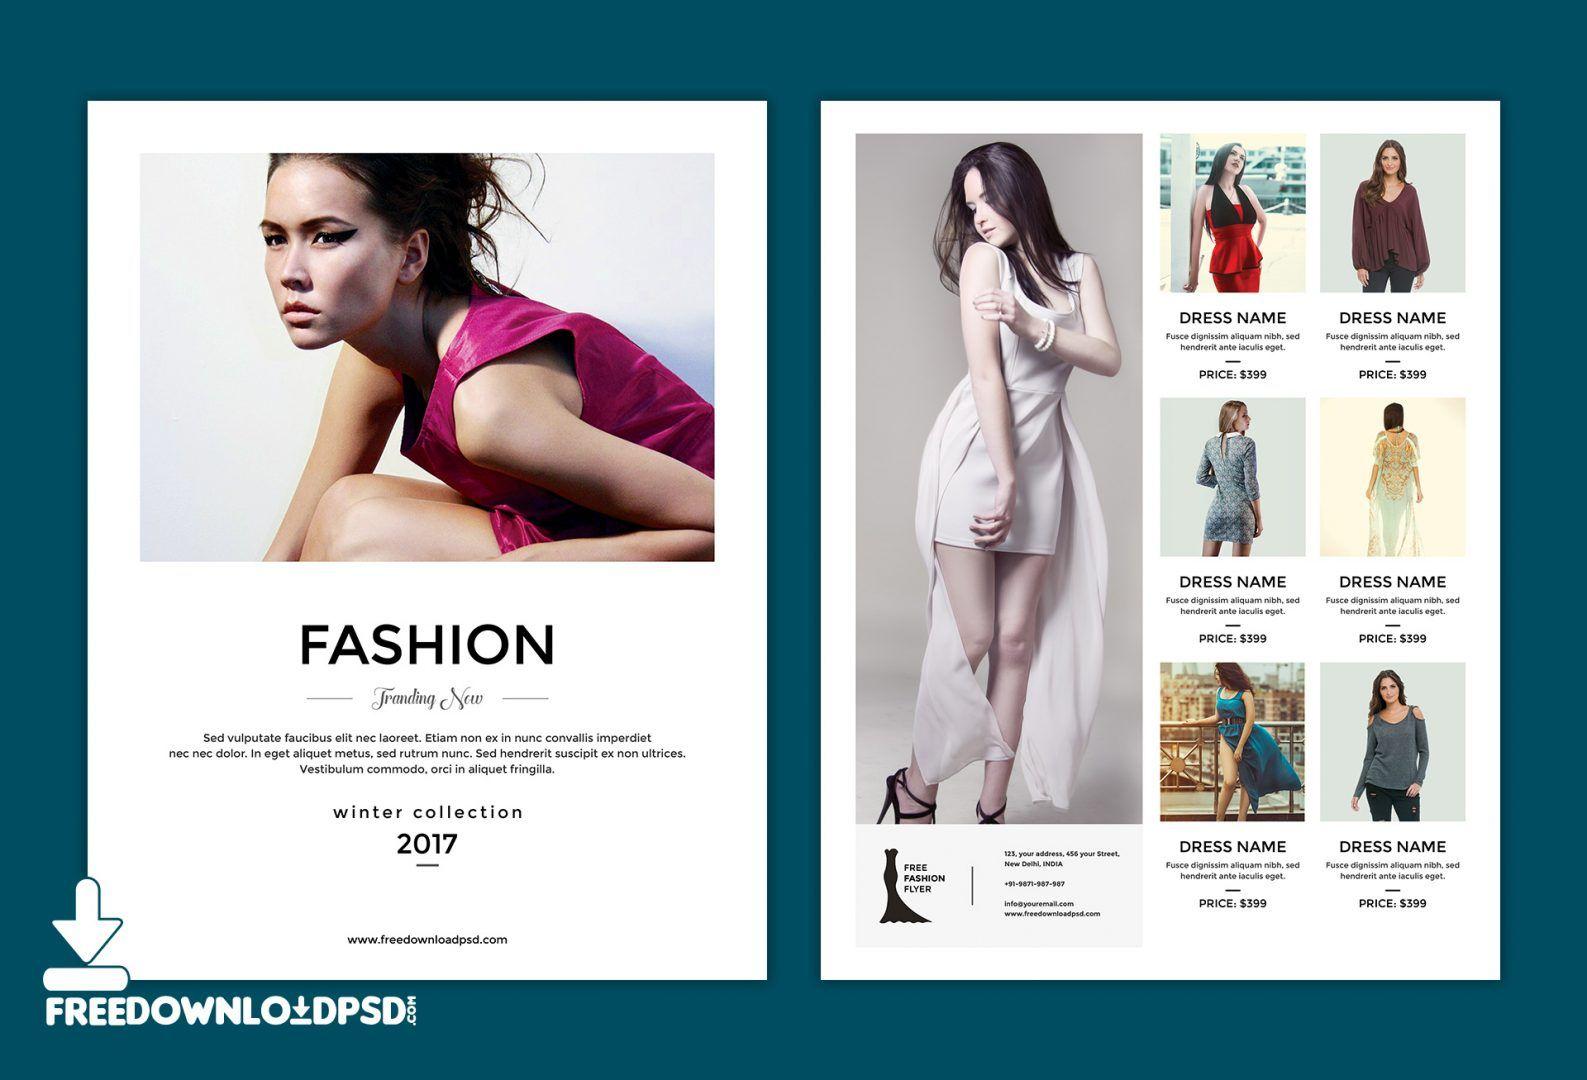 merveilleux Best Multipurpose Fashion Flyer PSD Templates u0026 Designs - Free u0026 Premium